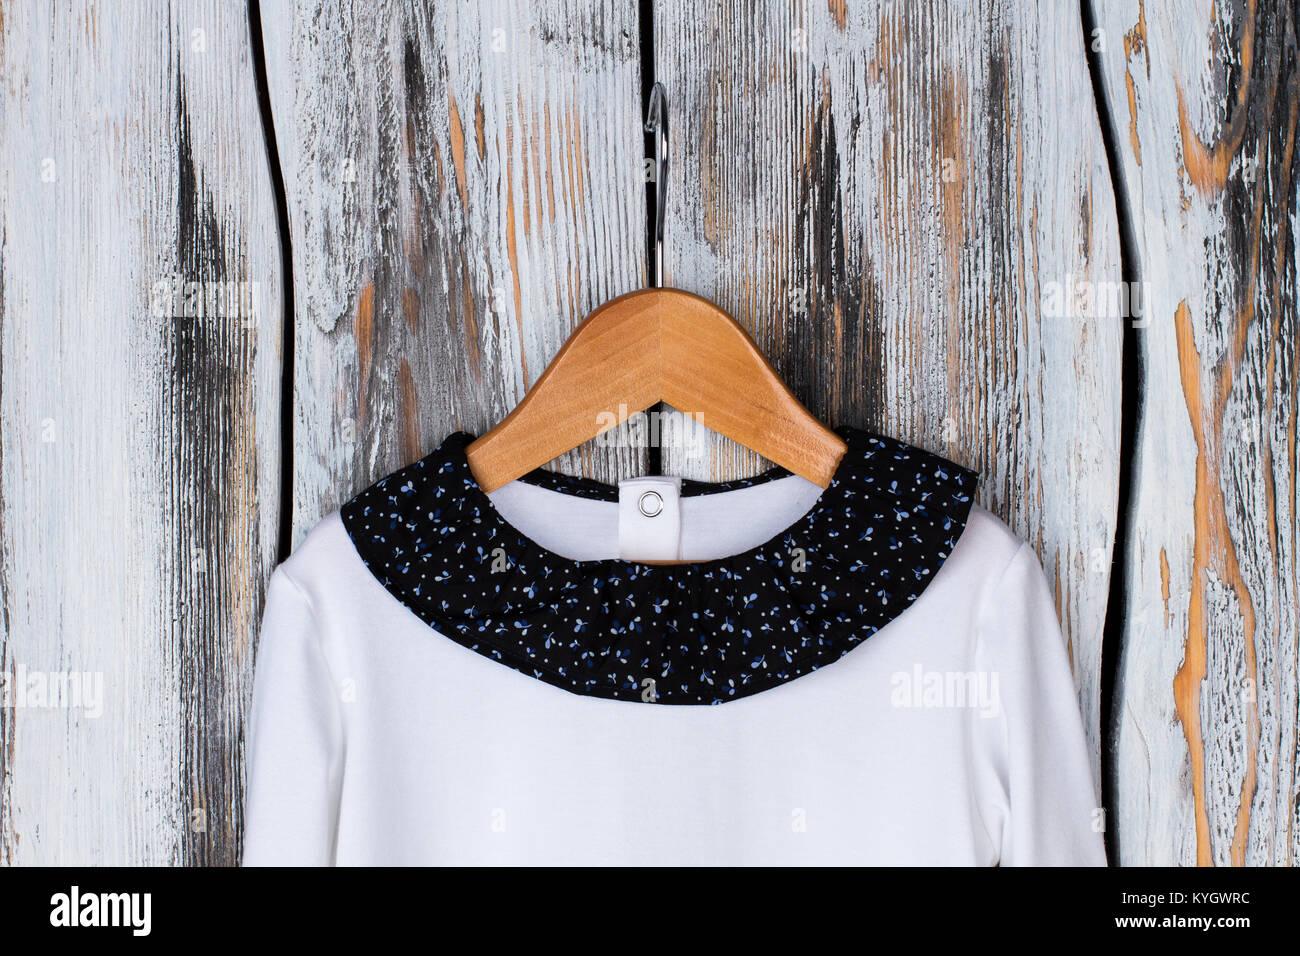 White top with round neckline - Stock Image